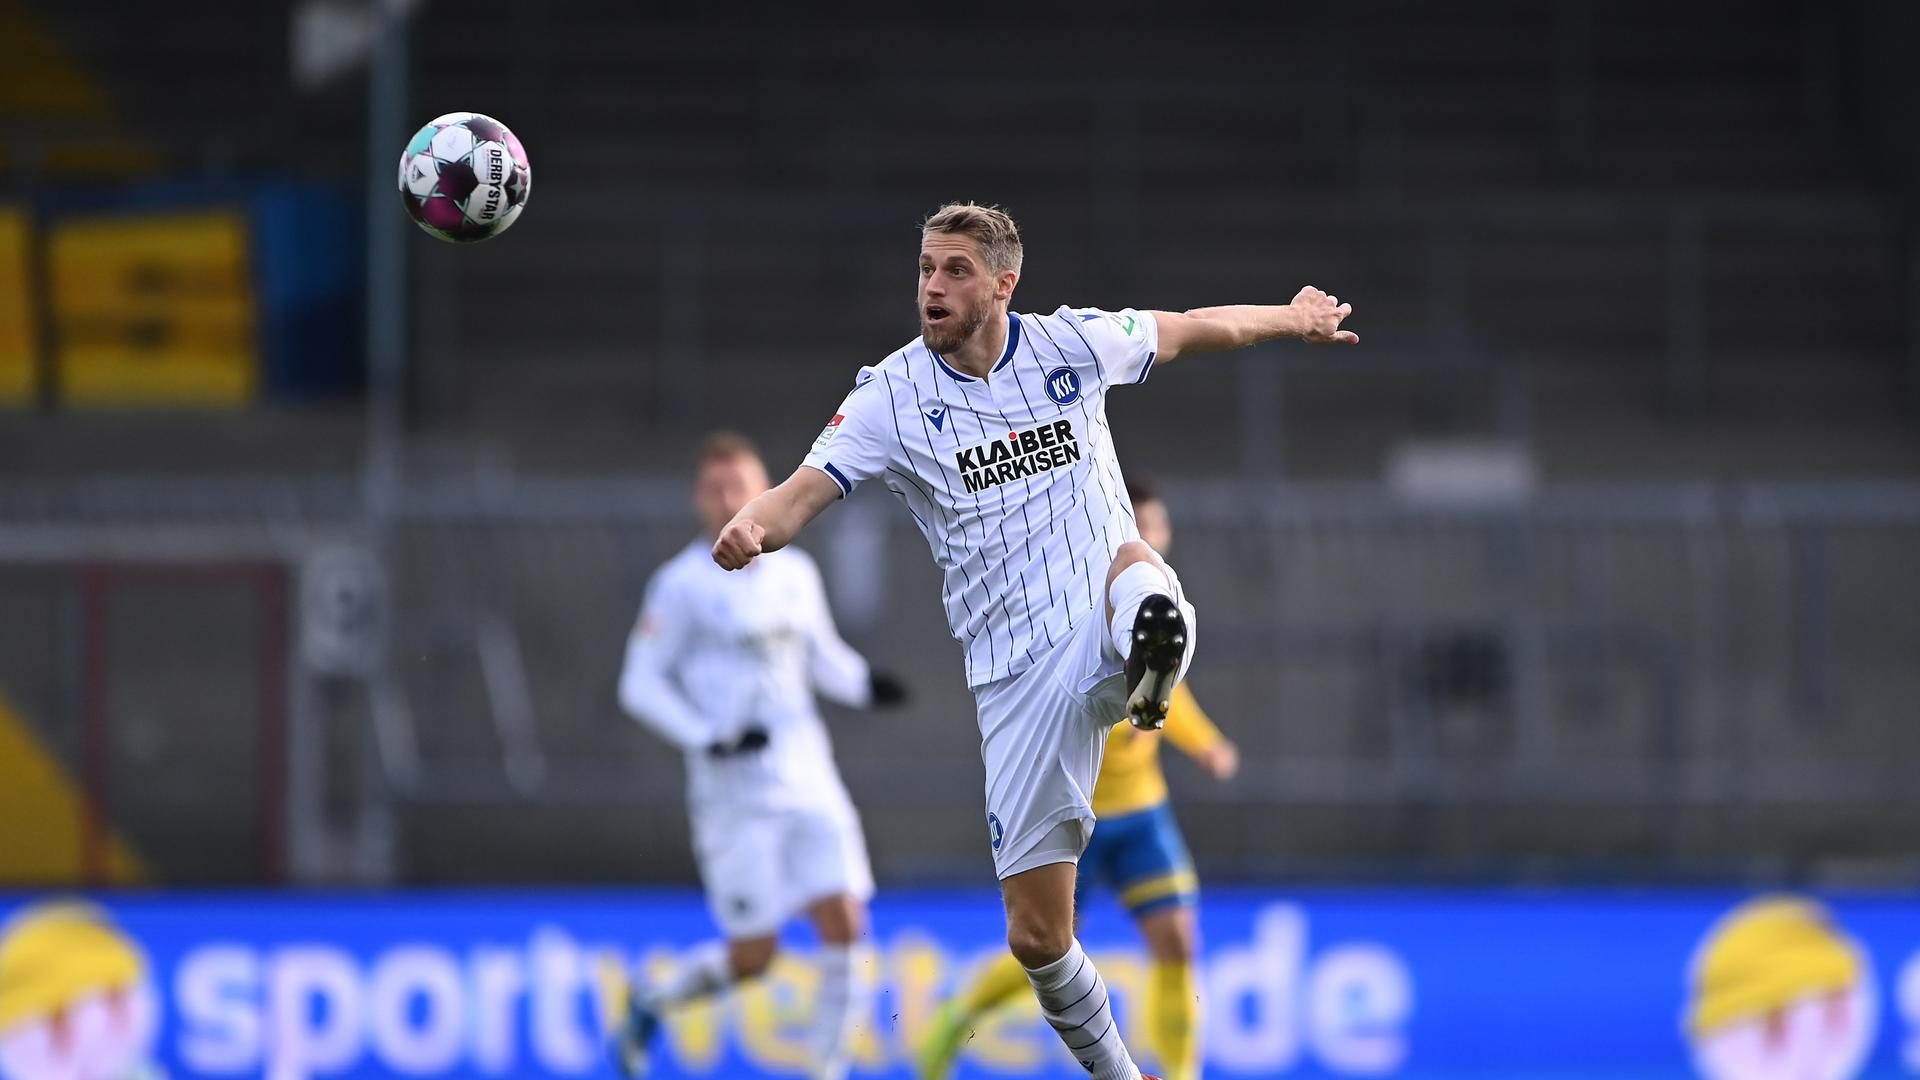 Marc Lorenz (KSC).  GES/ Fussball/ 2. Bundesliga: Eintracht Braunschweig - Karlsruher SC, 21.11.2020  Football / Soccer: 2nd League: Eintracht Braunschweig vs Karlsruher Sport-Club, Brunswick, November 21, 2020